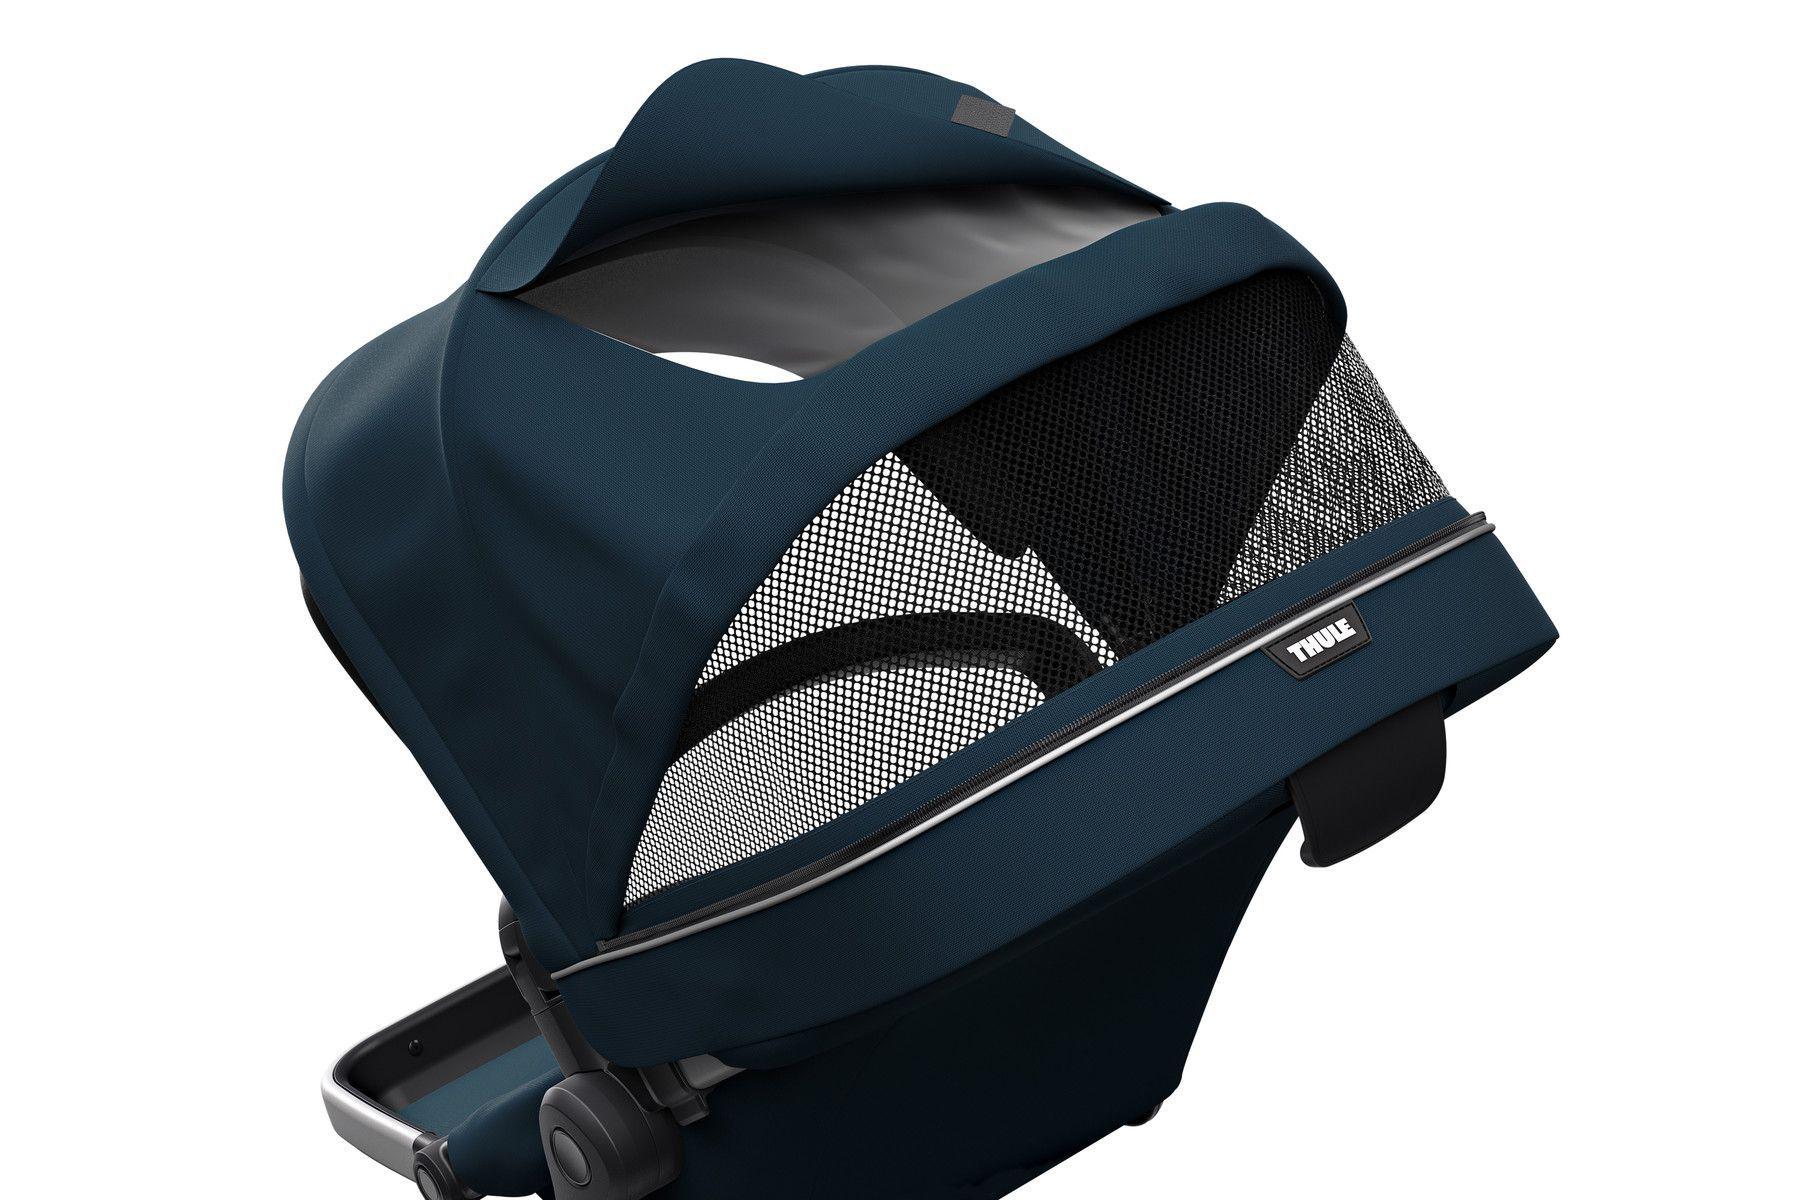 ASSENTO EXTRA PARA THULE SLEEK DUPLO - NAVY BLUE - THULE